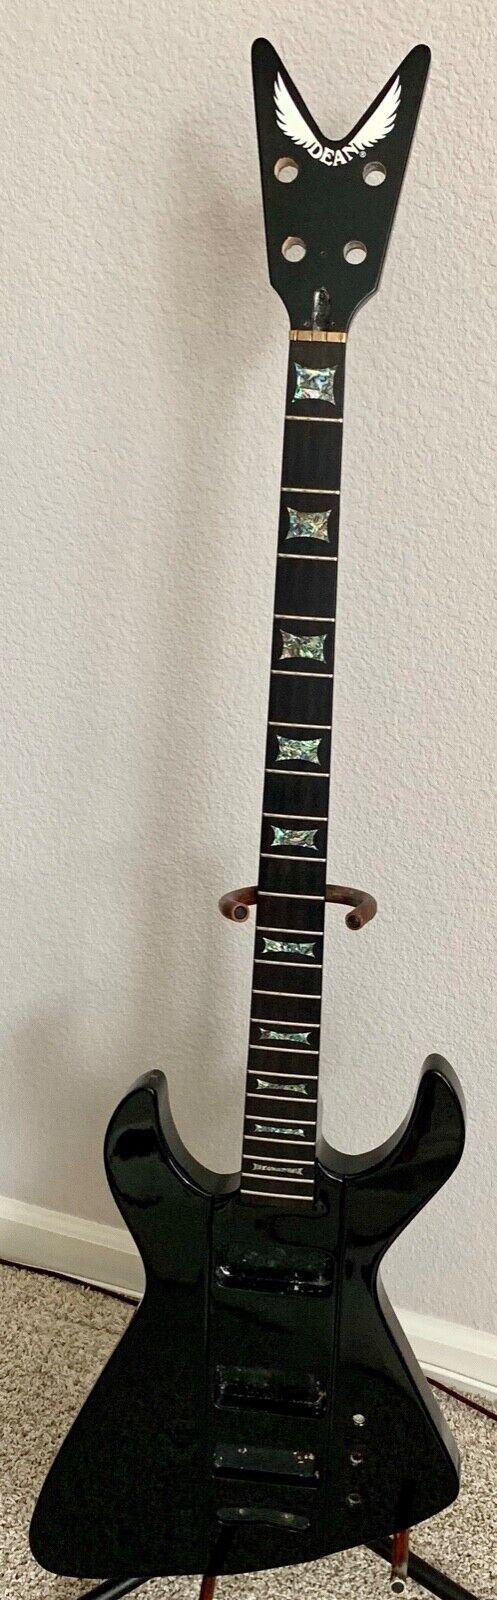 2008 Dean Demonator Bass Guitar Original Solid Body Neck Project